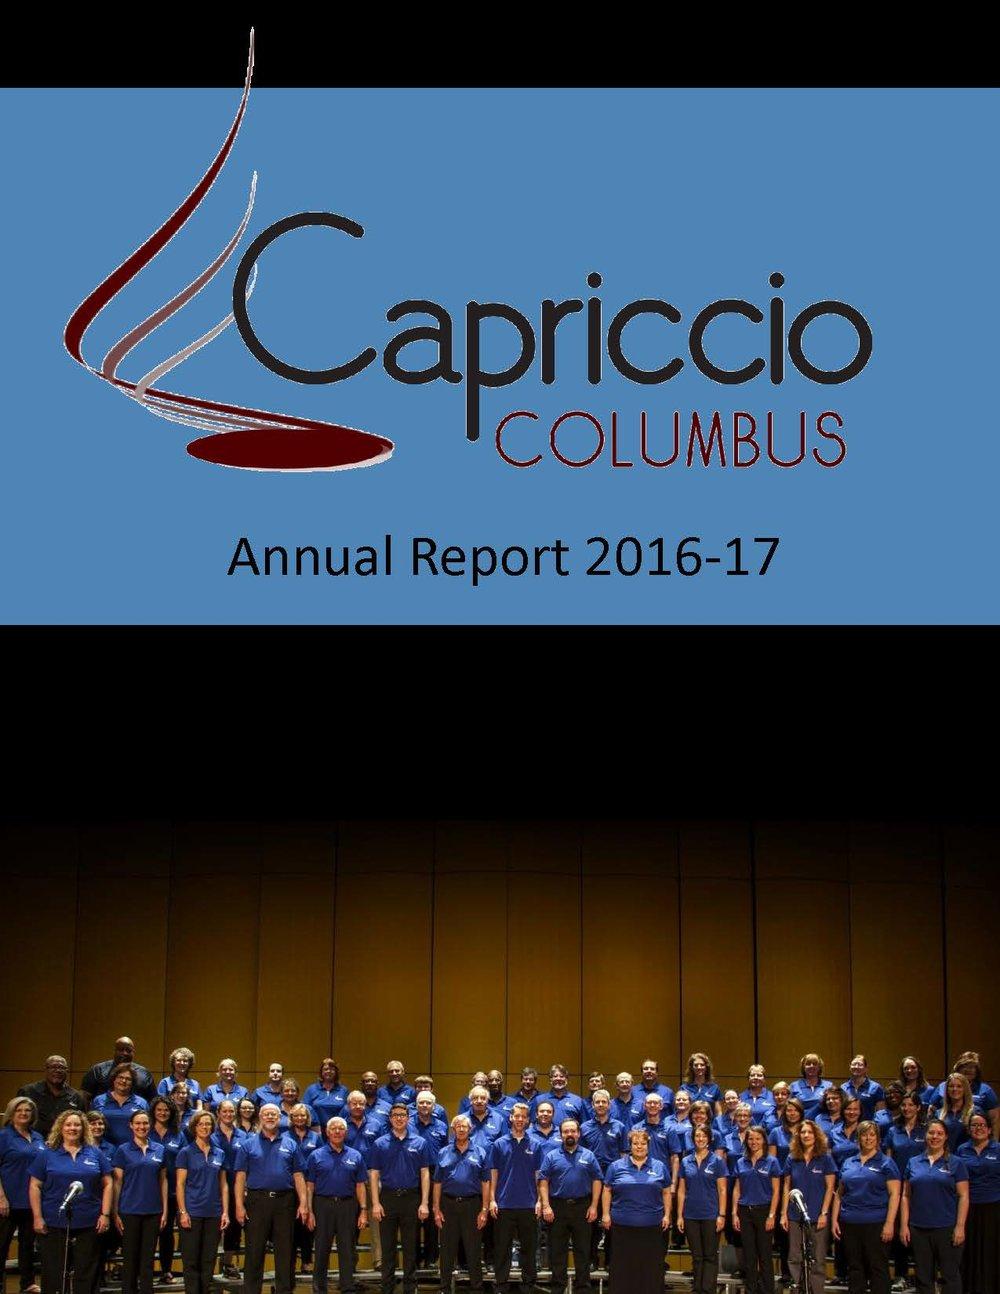 Annual Report 16-17 1.jpg